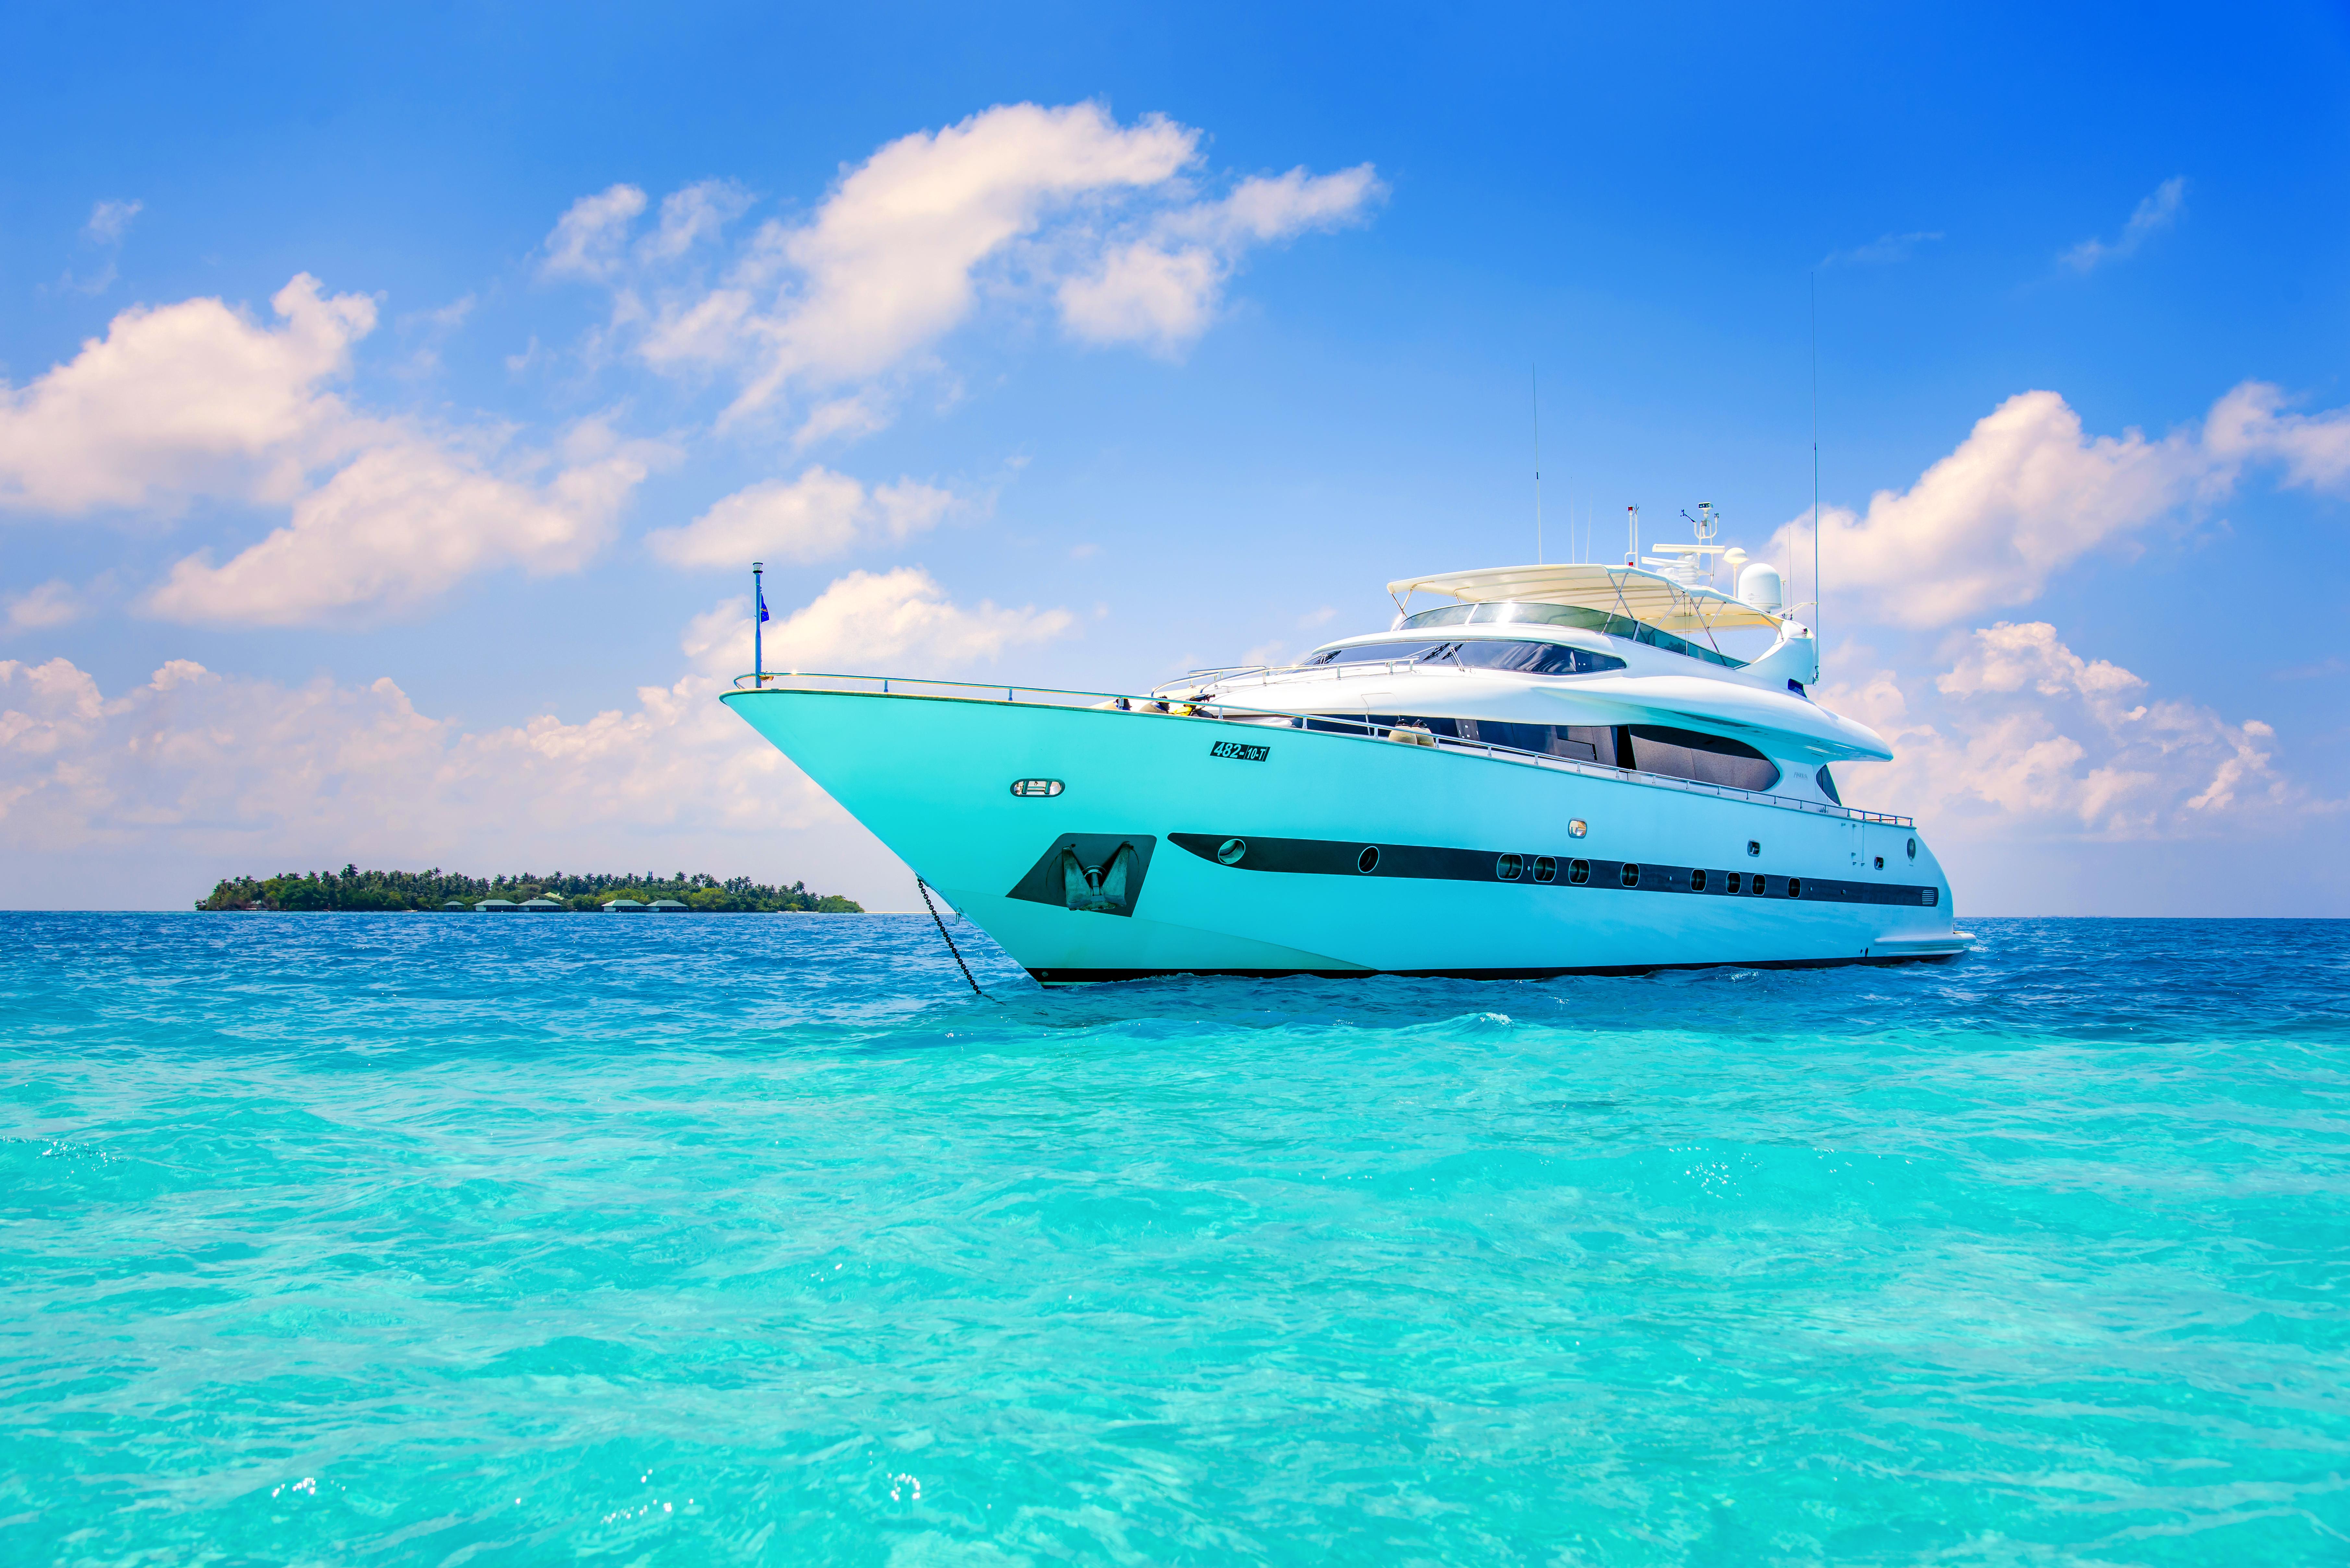 Картинки для, картинки с яхтой на море